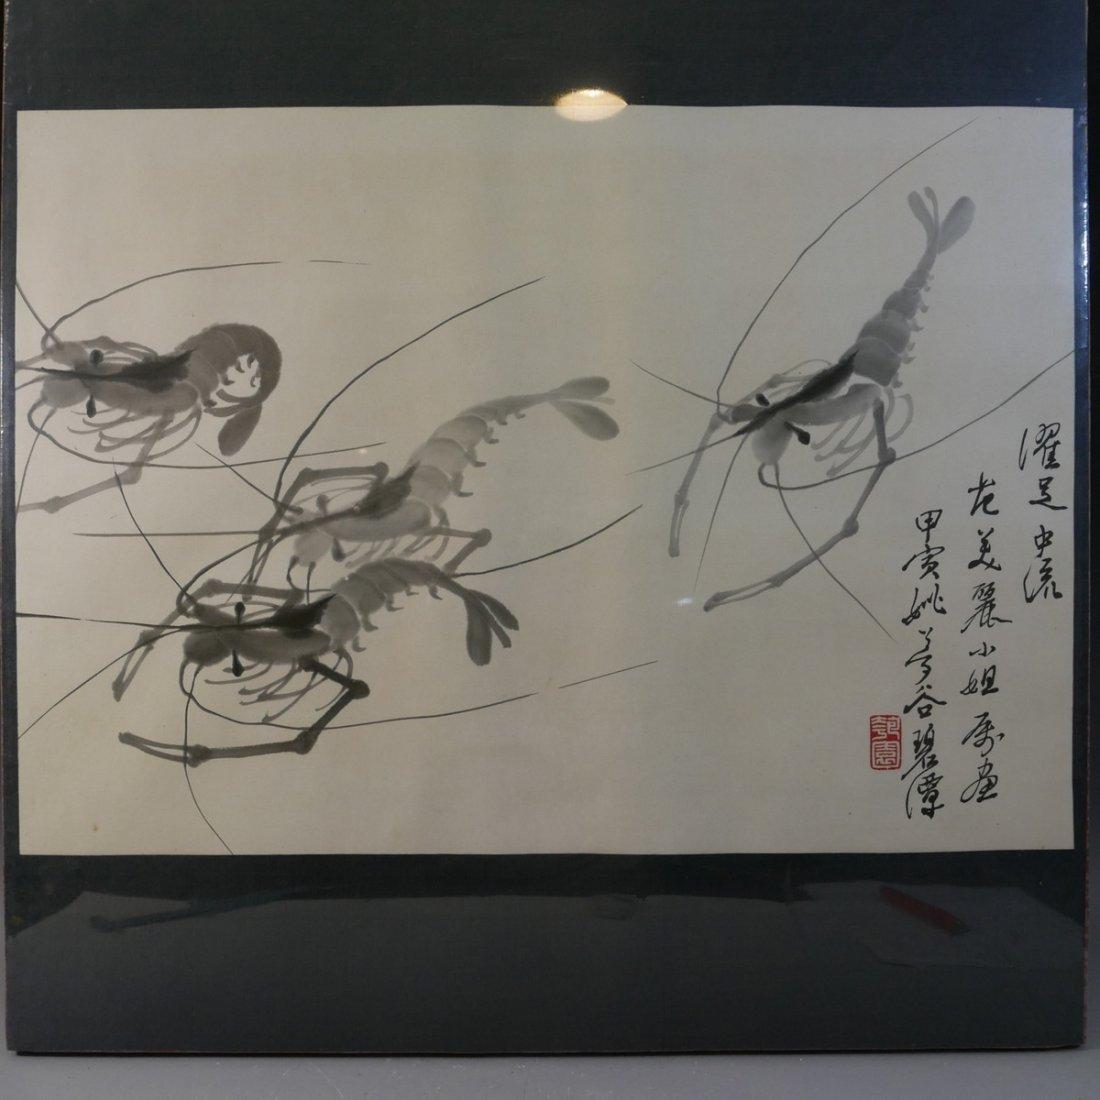 YAO MENGGU (1912 - 1993), WATERCOLOR SHRIMP, FRAMED